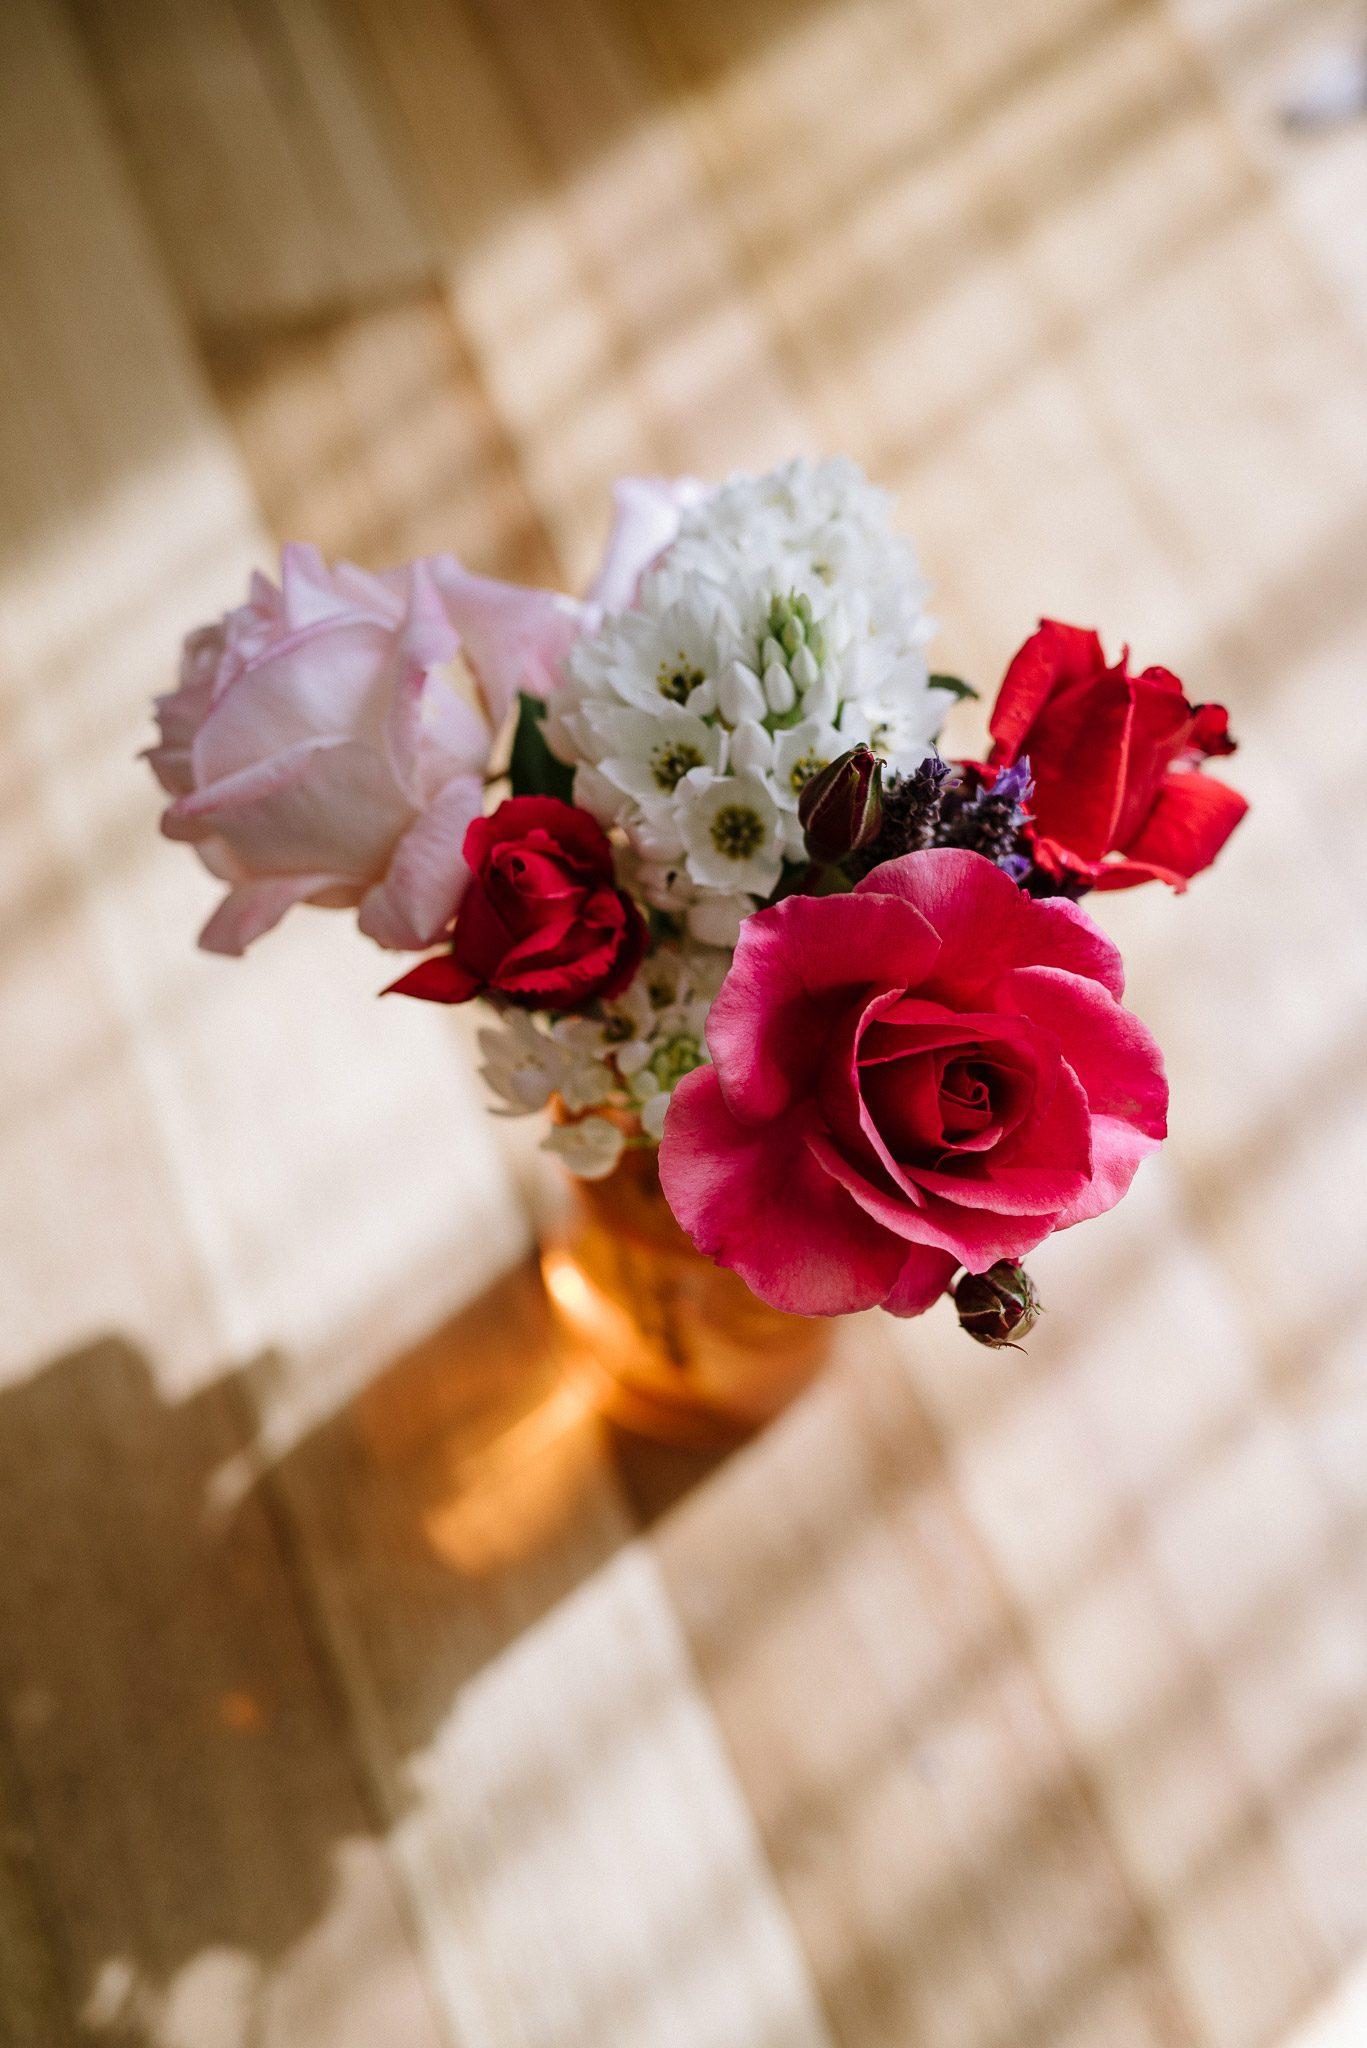 Flowers in the boudoir studio